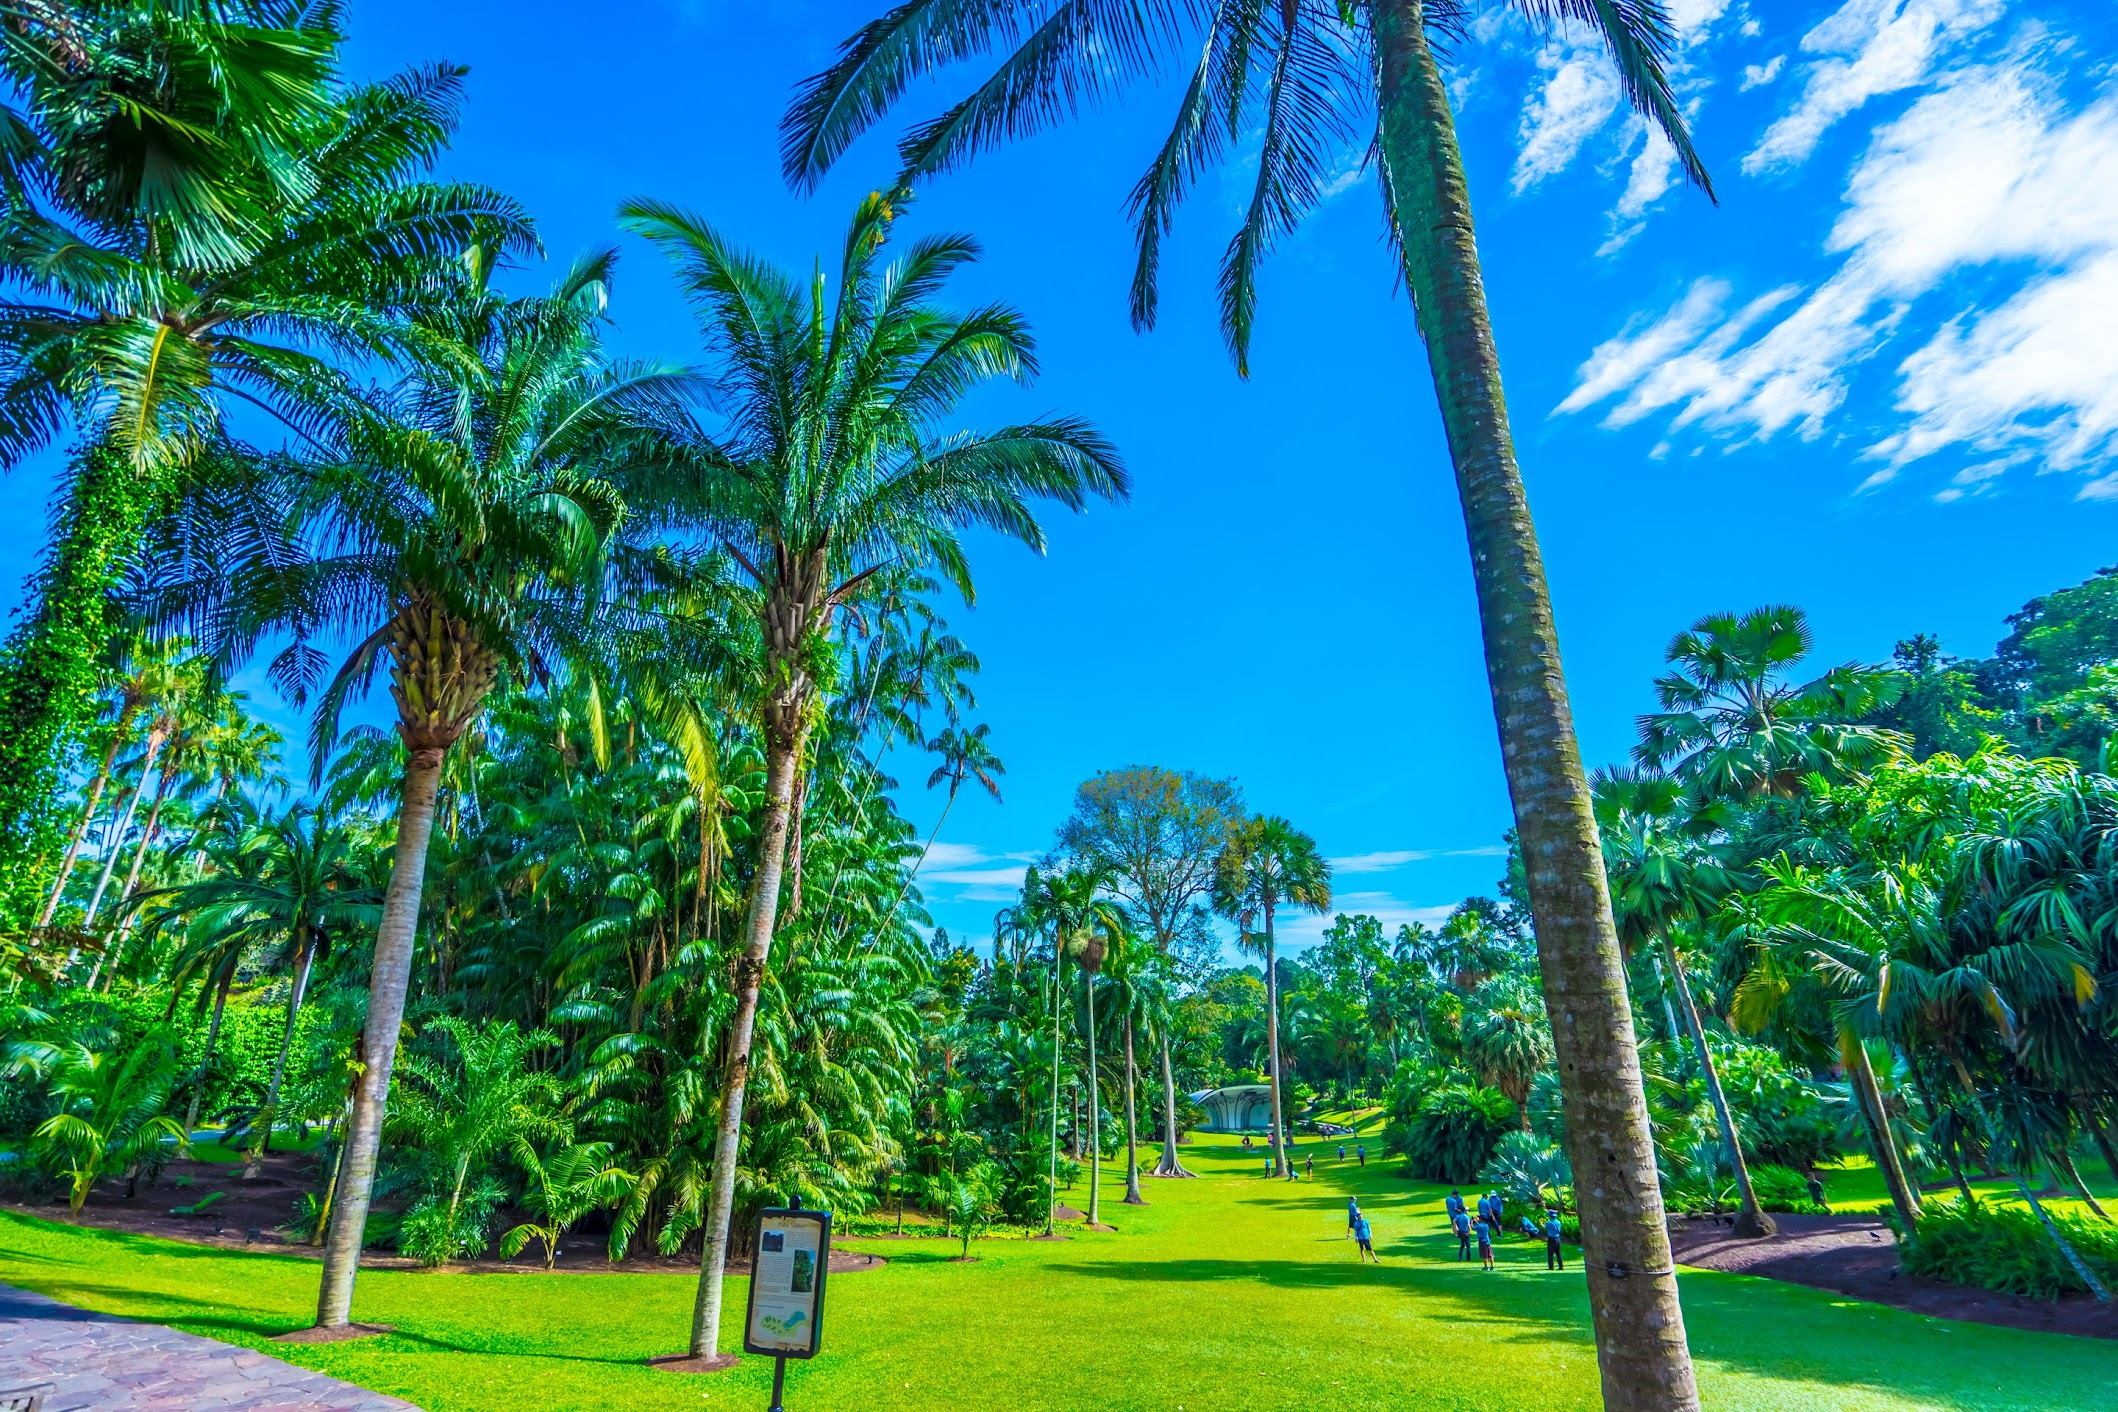 Singapore Botanic Gardens Palm Valley1